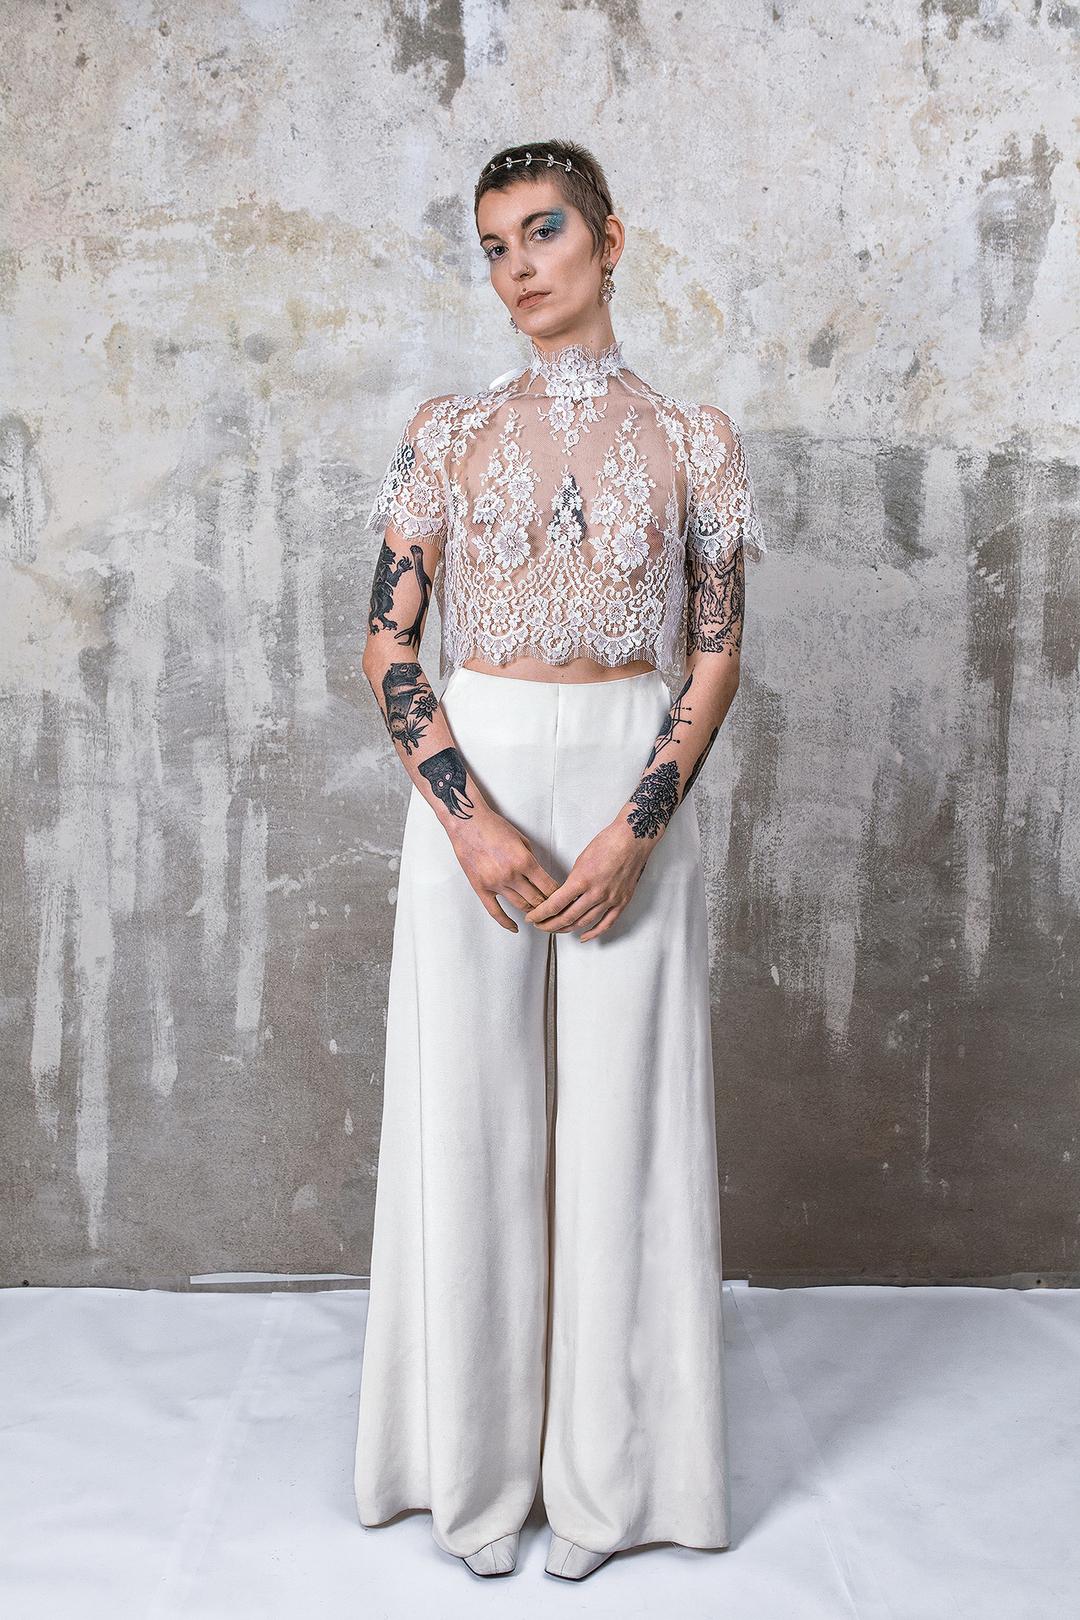 shiro pants dress photo